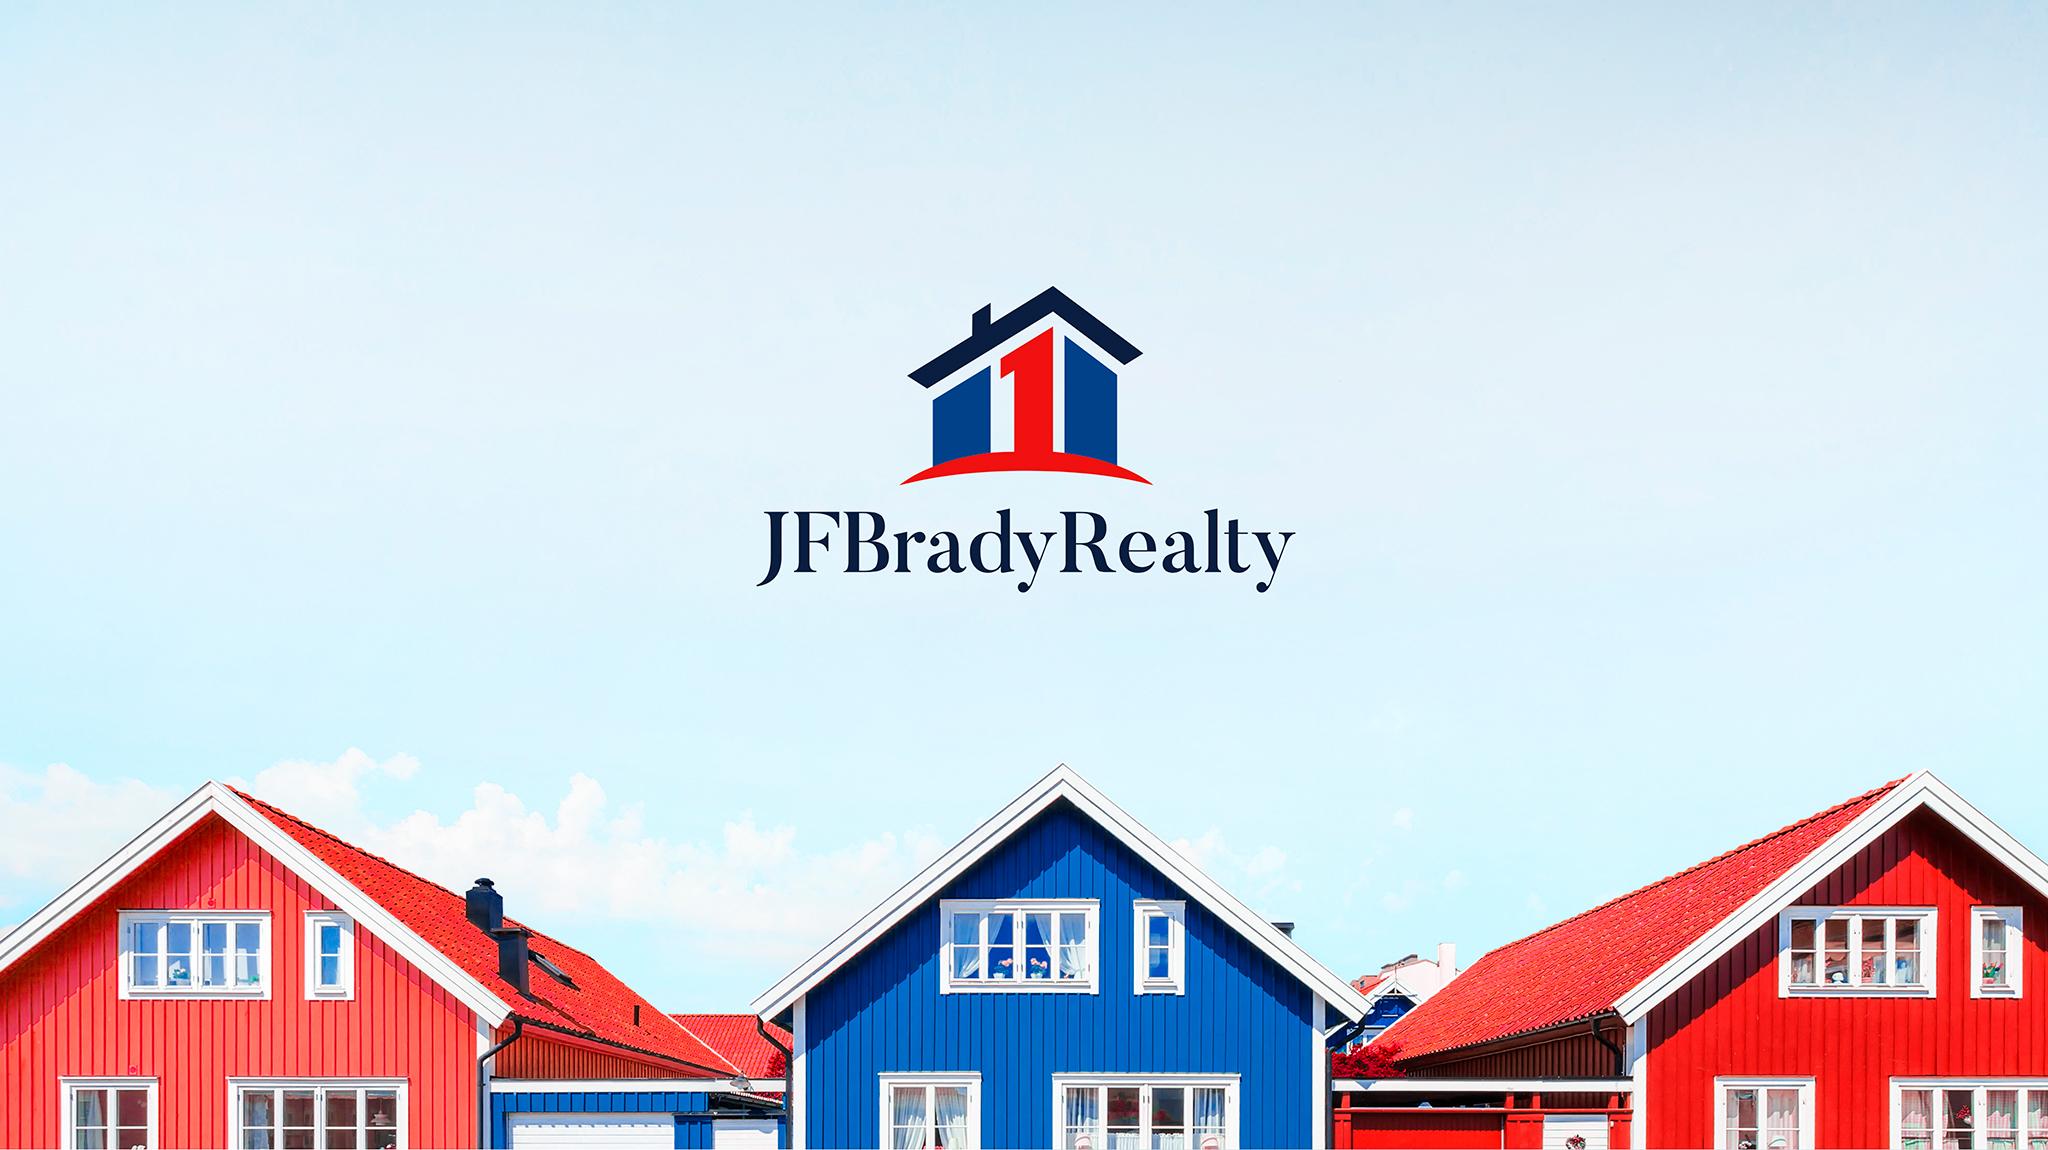 JFrealty   Get #1 Branding Your Business   Branding Agency Branding